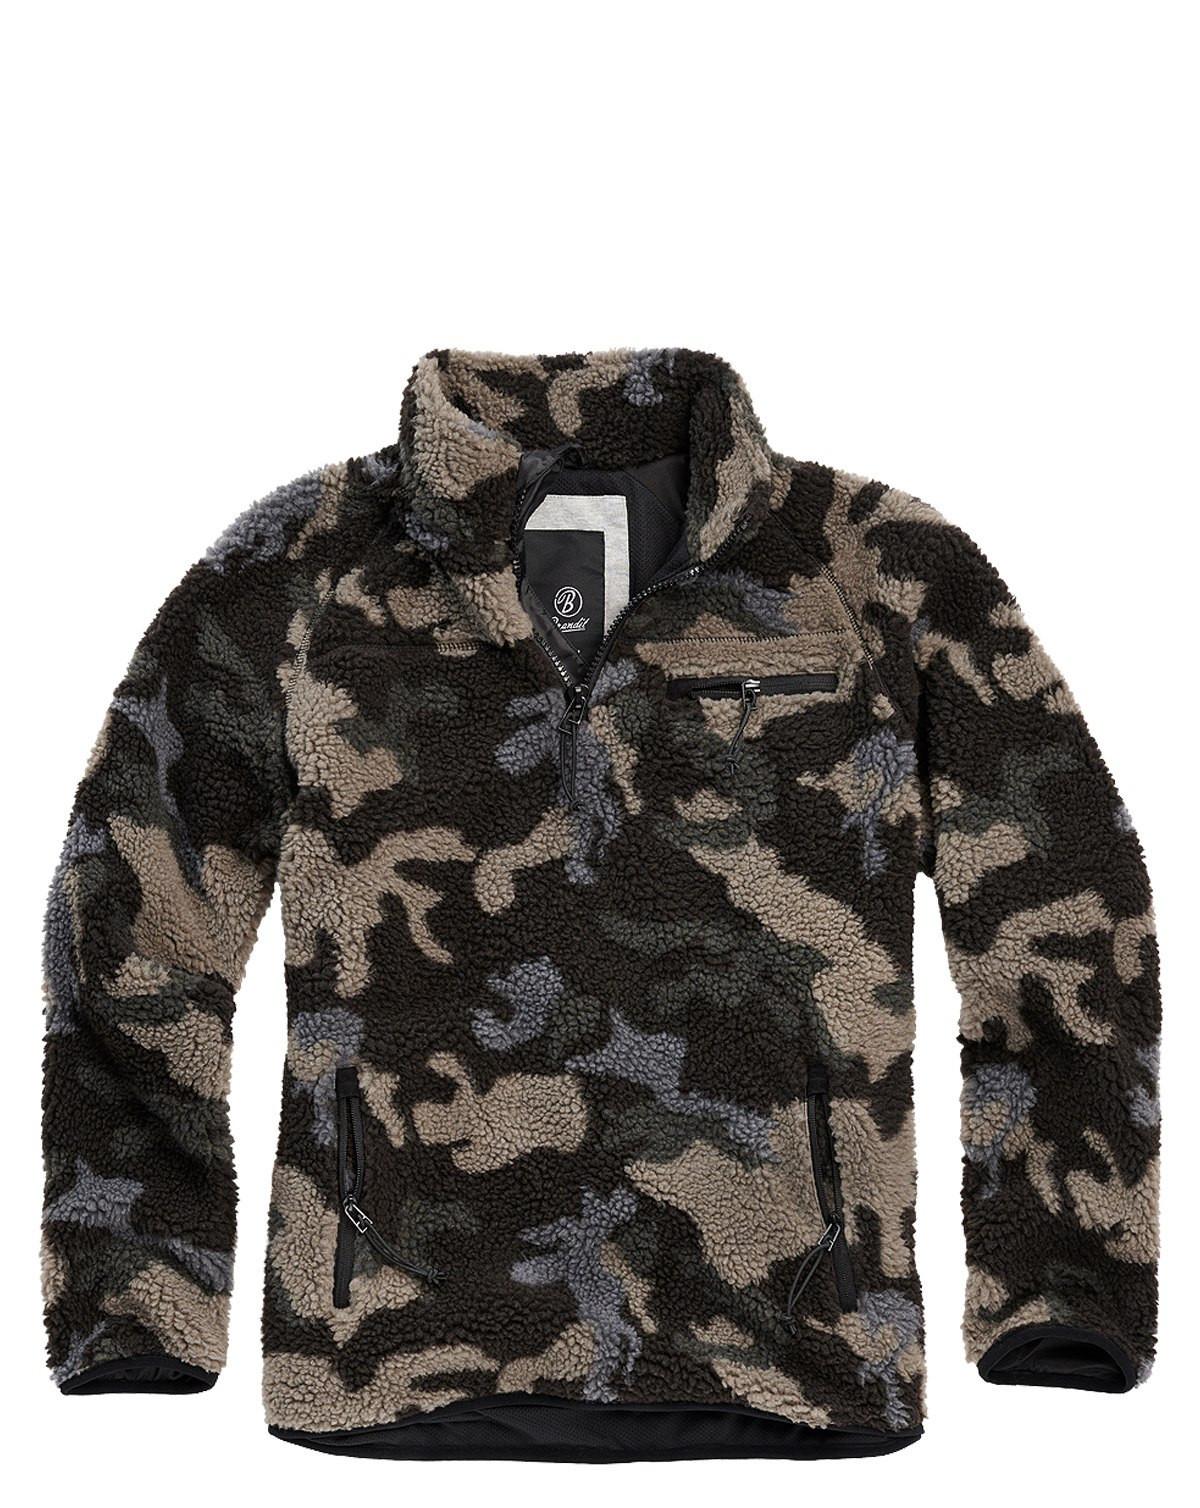 Brandit Teddyfleece Troyer Sweatshirt (Dark Camo, XL)